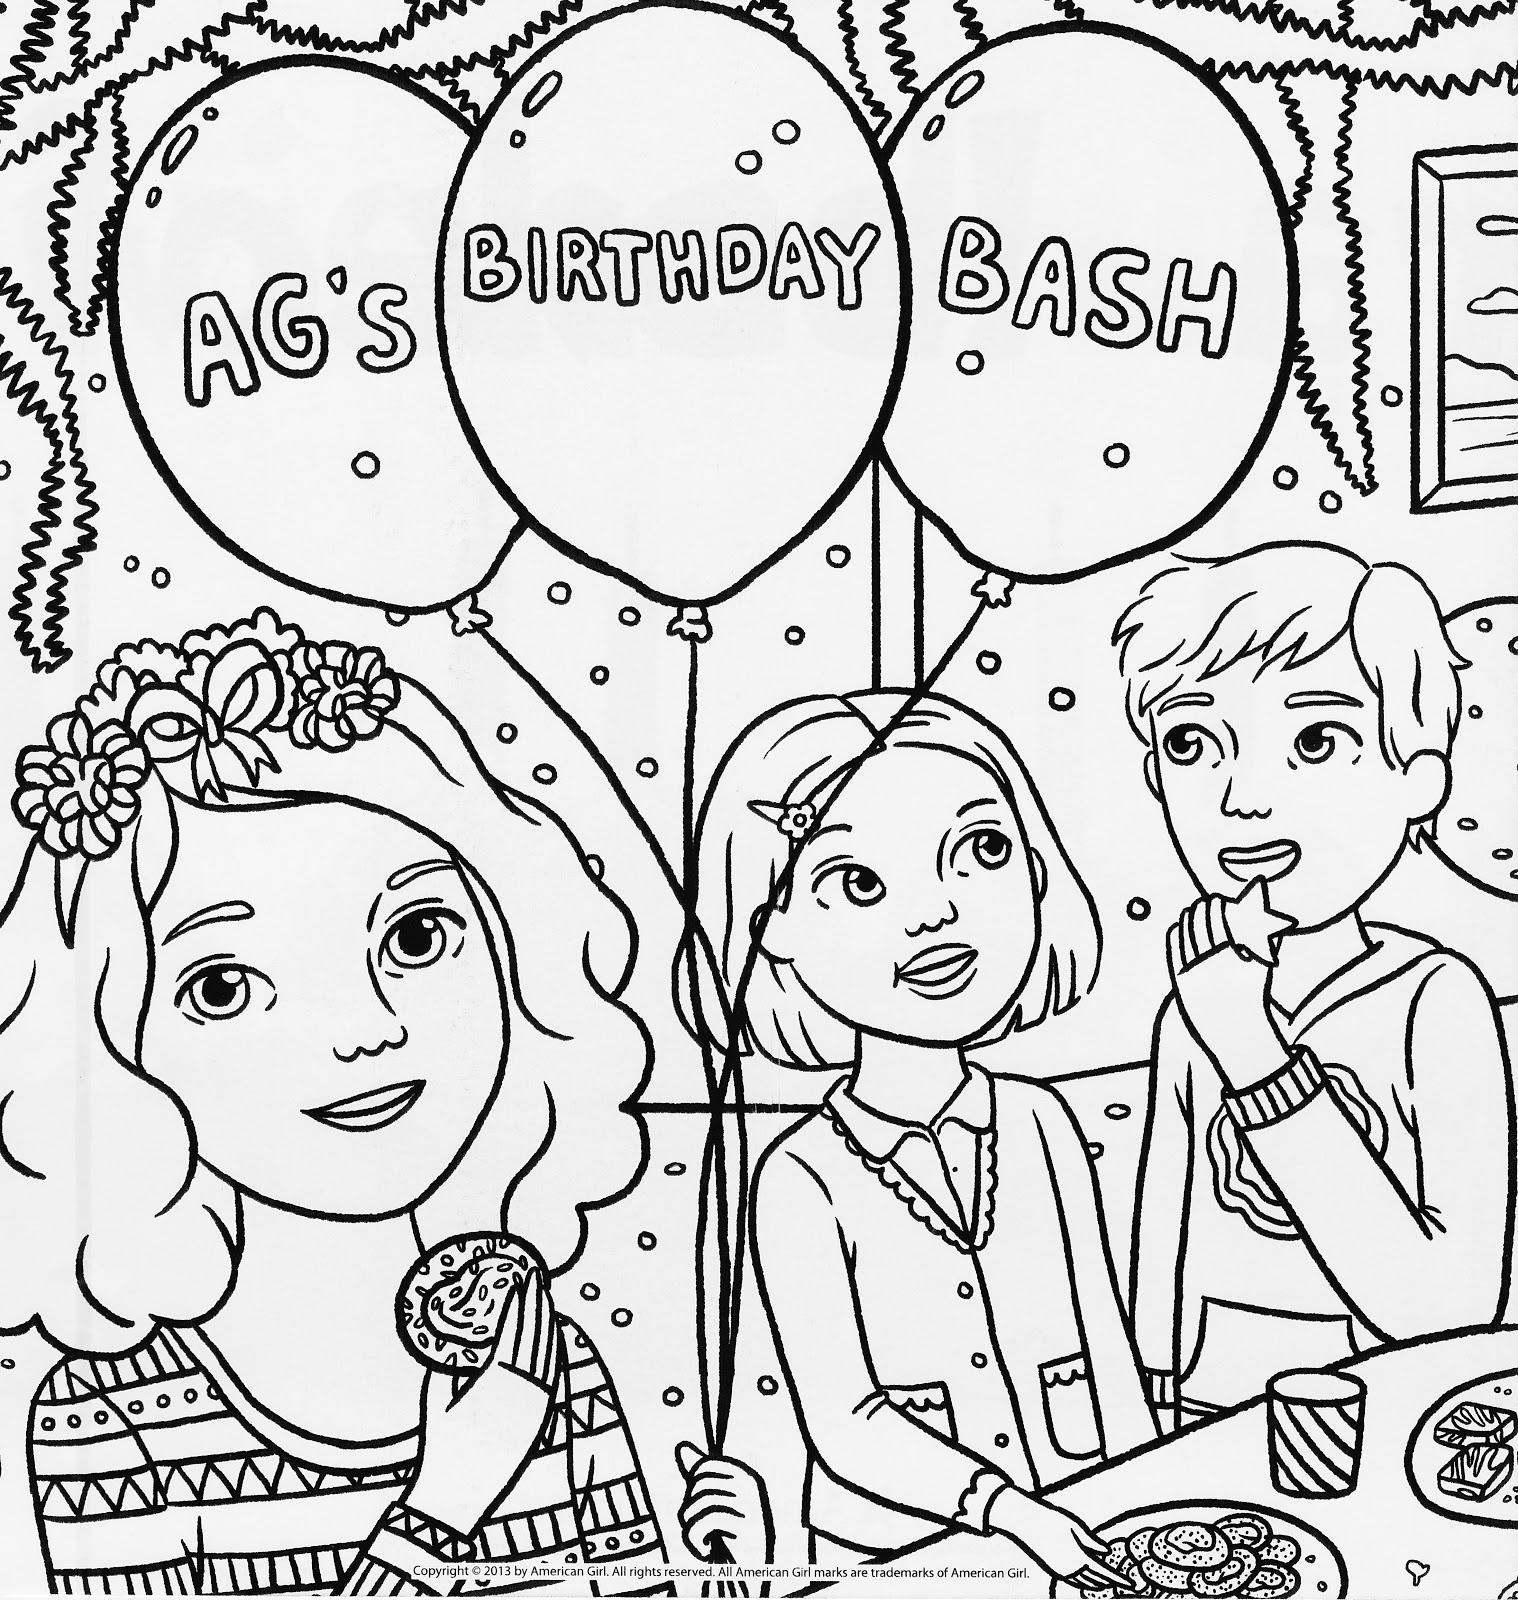 Bonggamom Finds American Girl Magazine Special Birthday